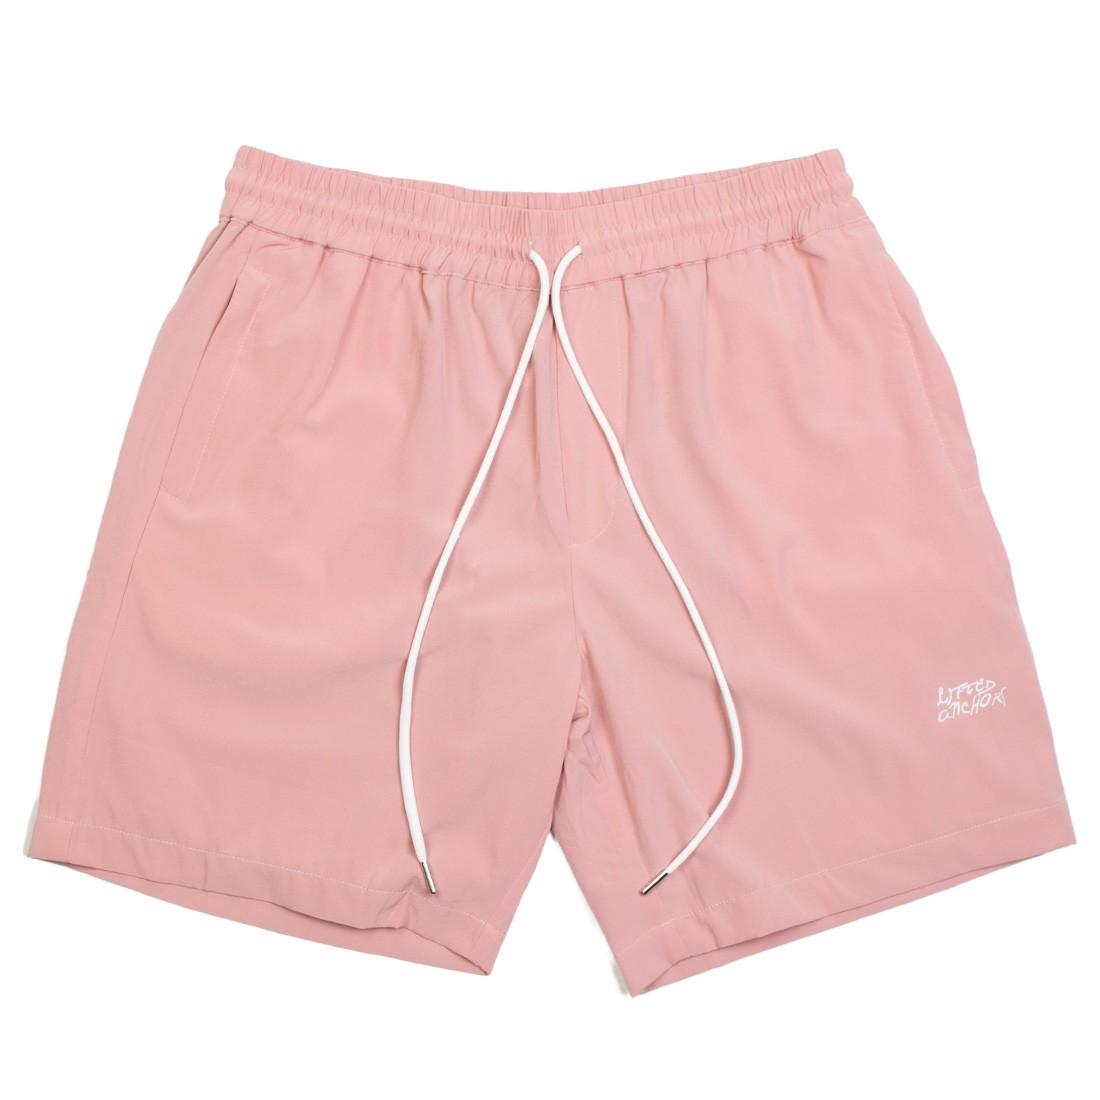 Lifted Anchors Men Server Shorts (pink / salmon)